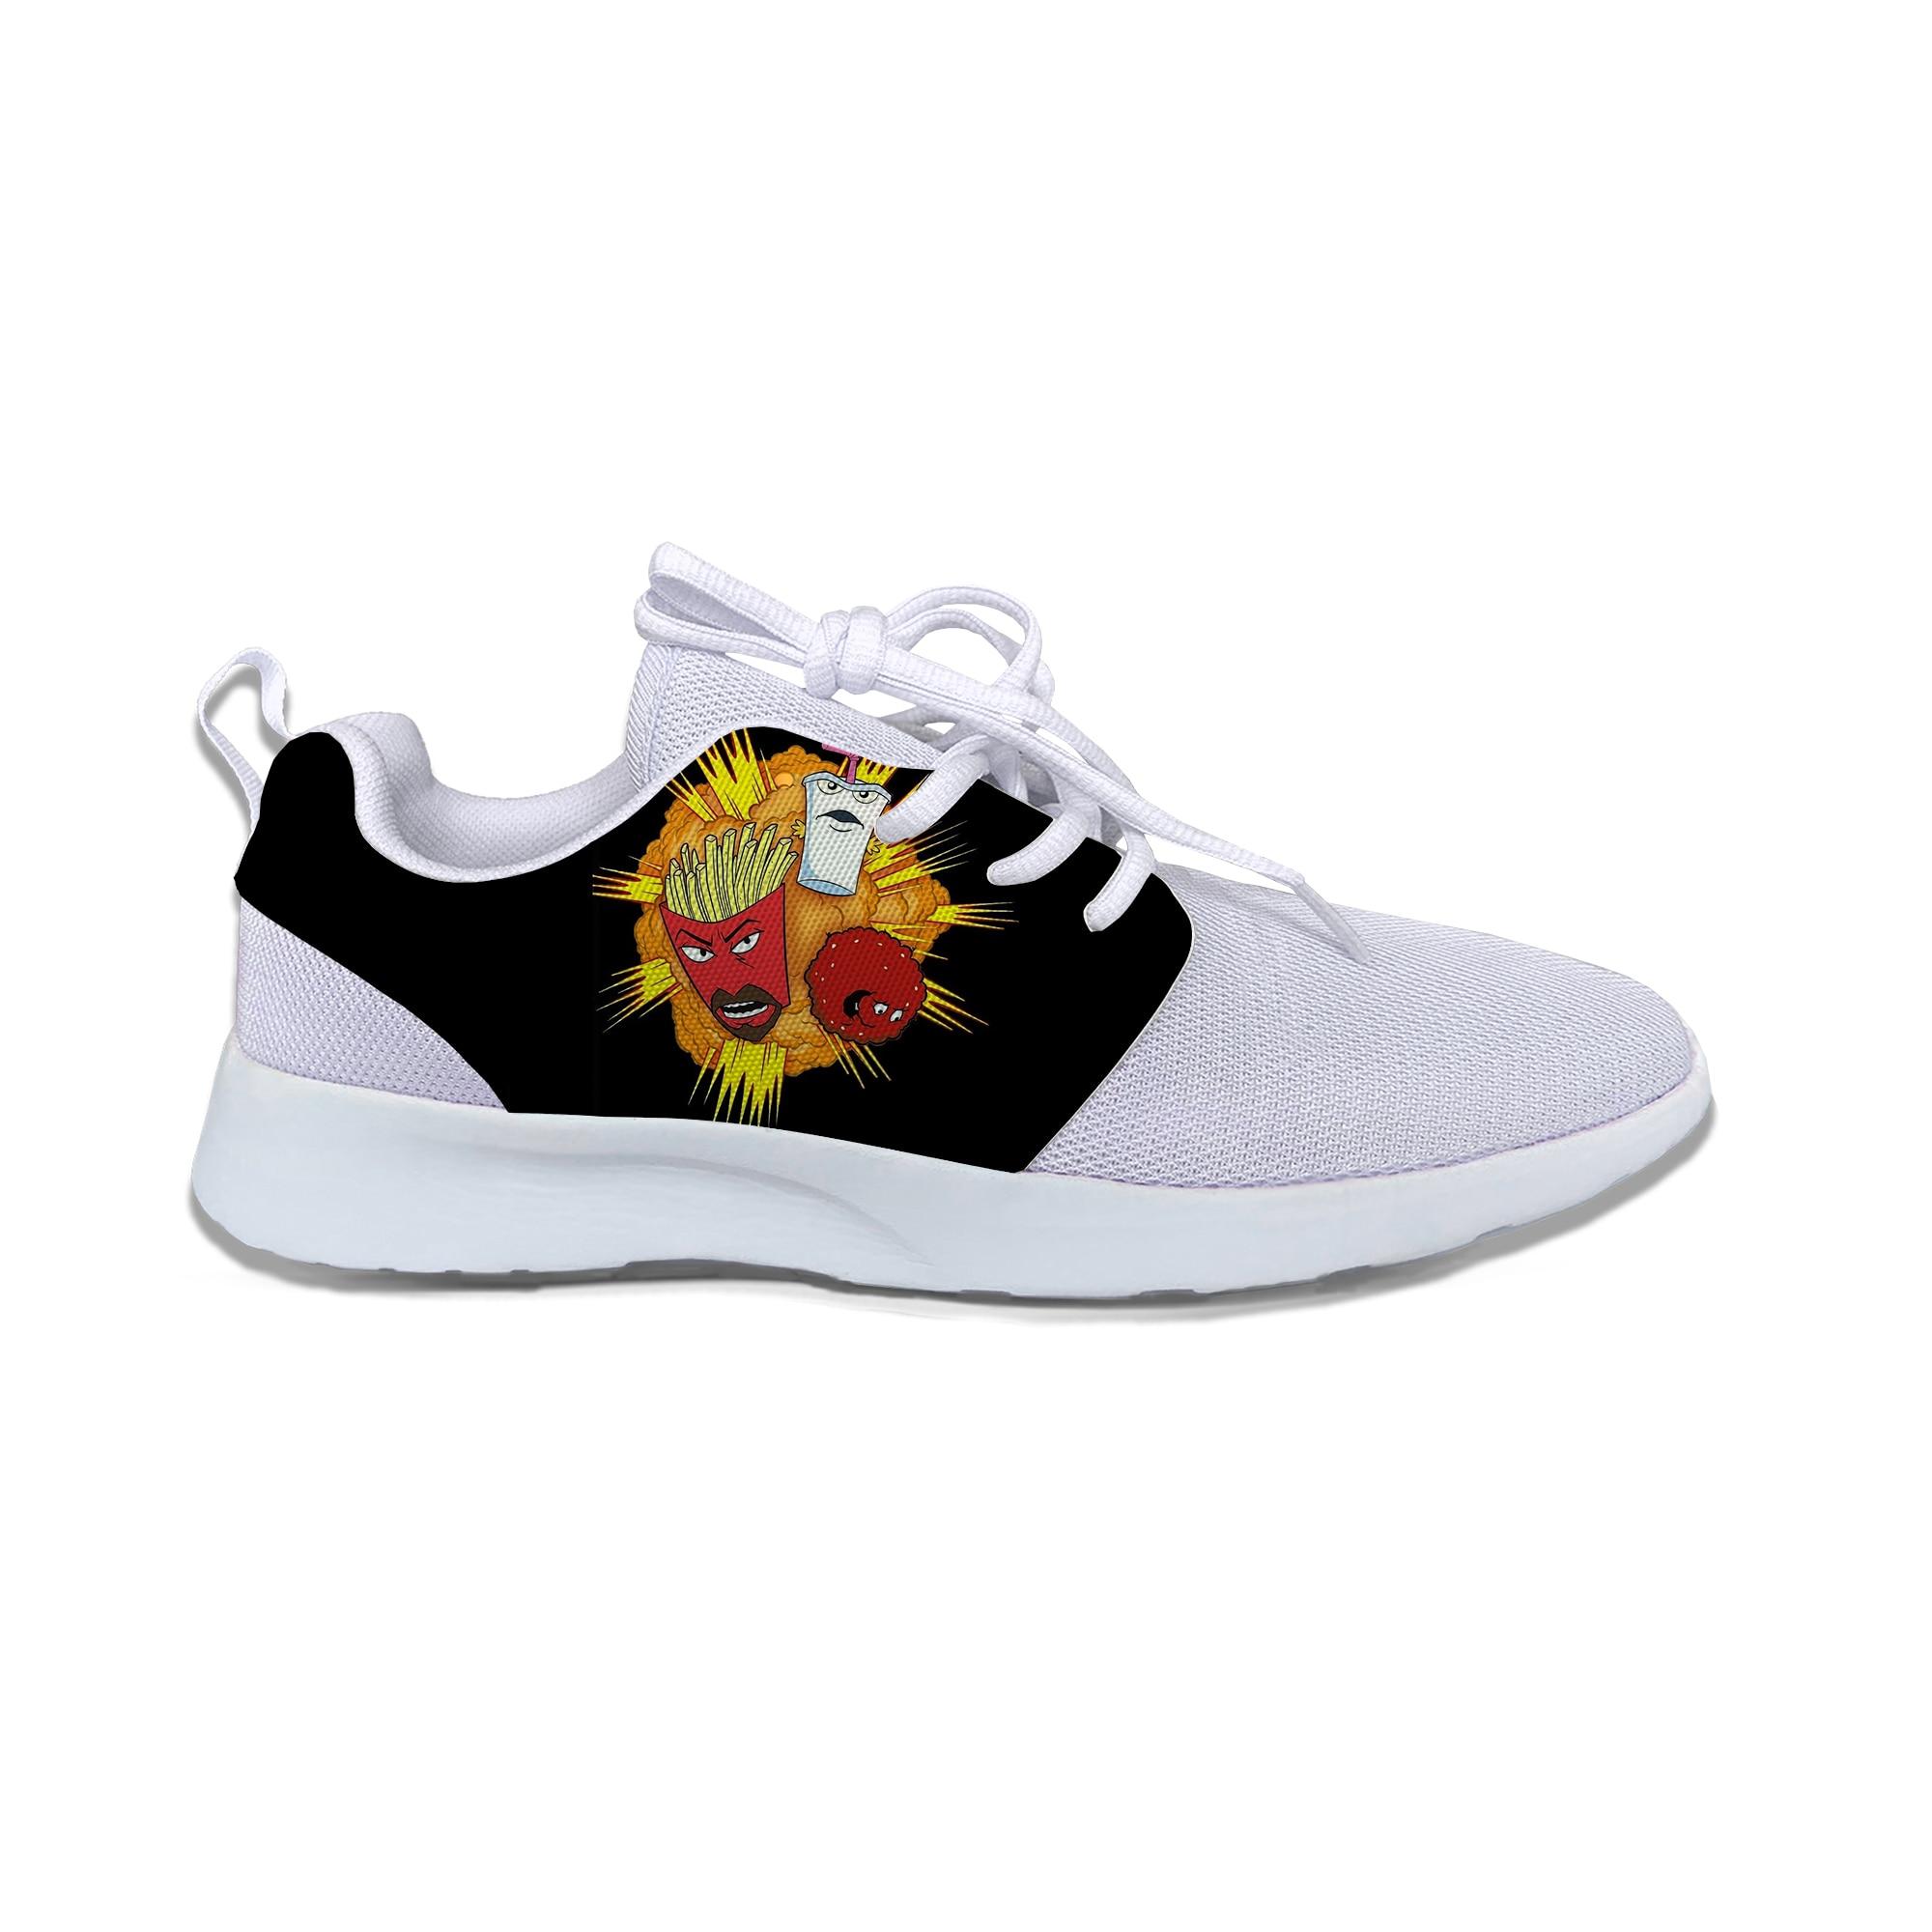 Aire deportivas de correr de malla caliente Aqua Teen Hunger Force clásico zapatos casuales zapatos transpirables zapatillas de deporte atléticos zapatos deportivos al aire libre